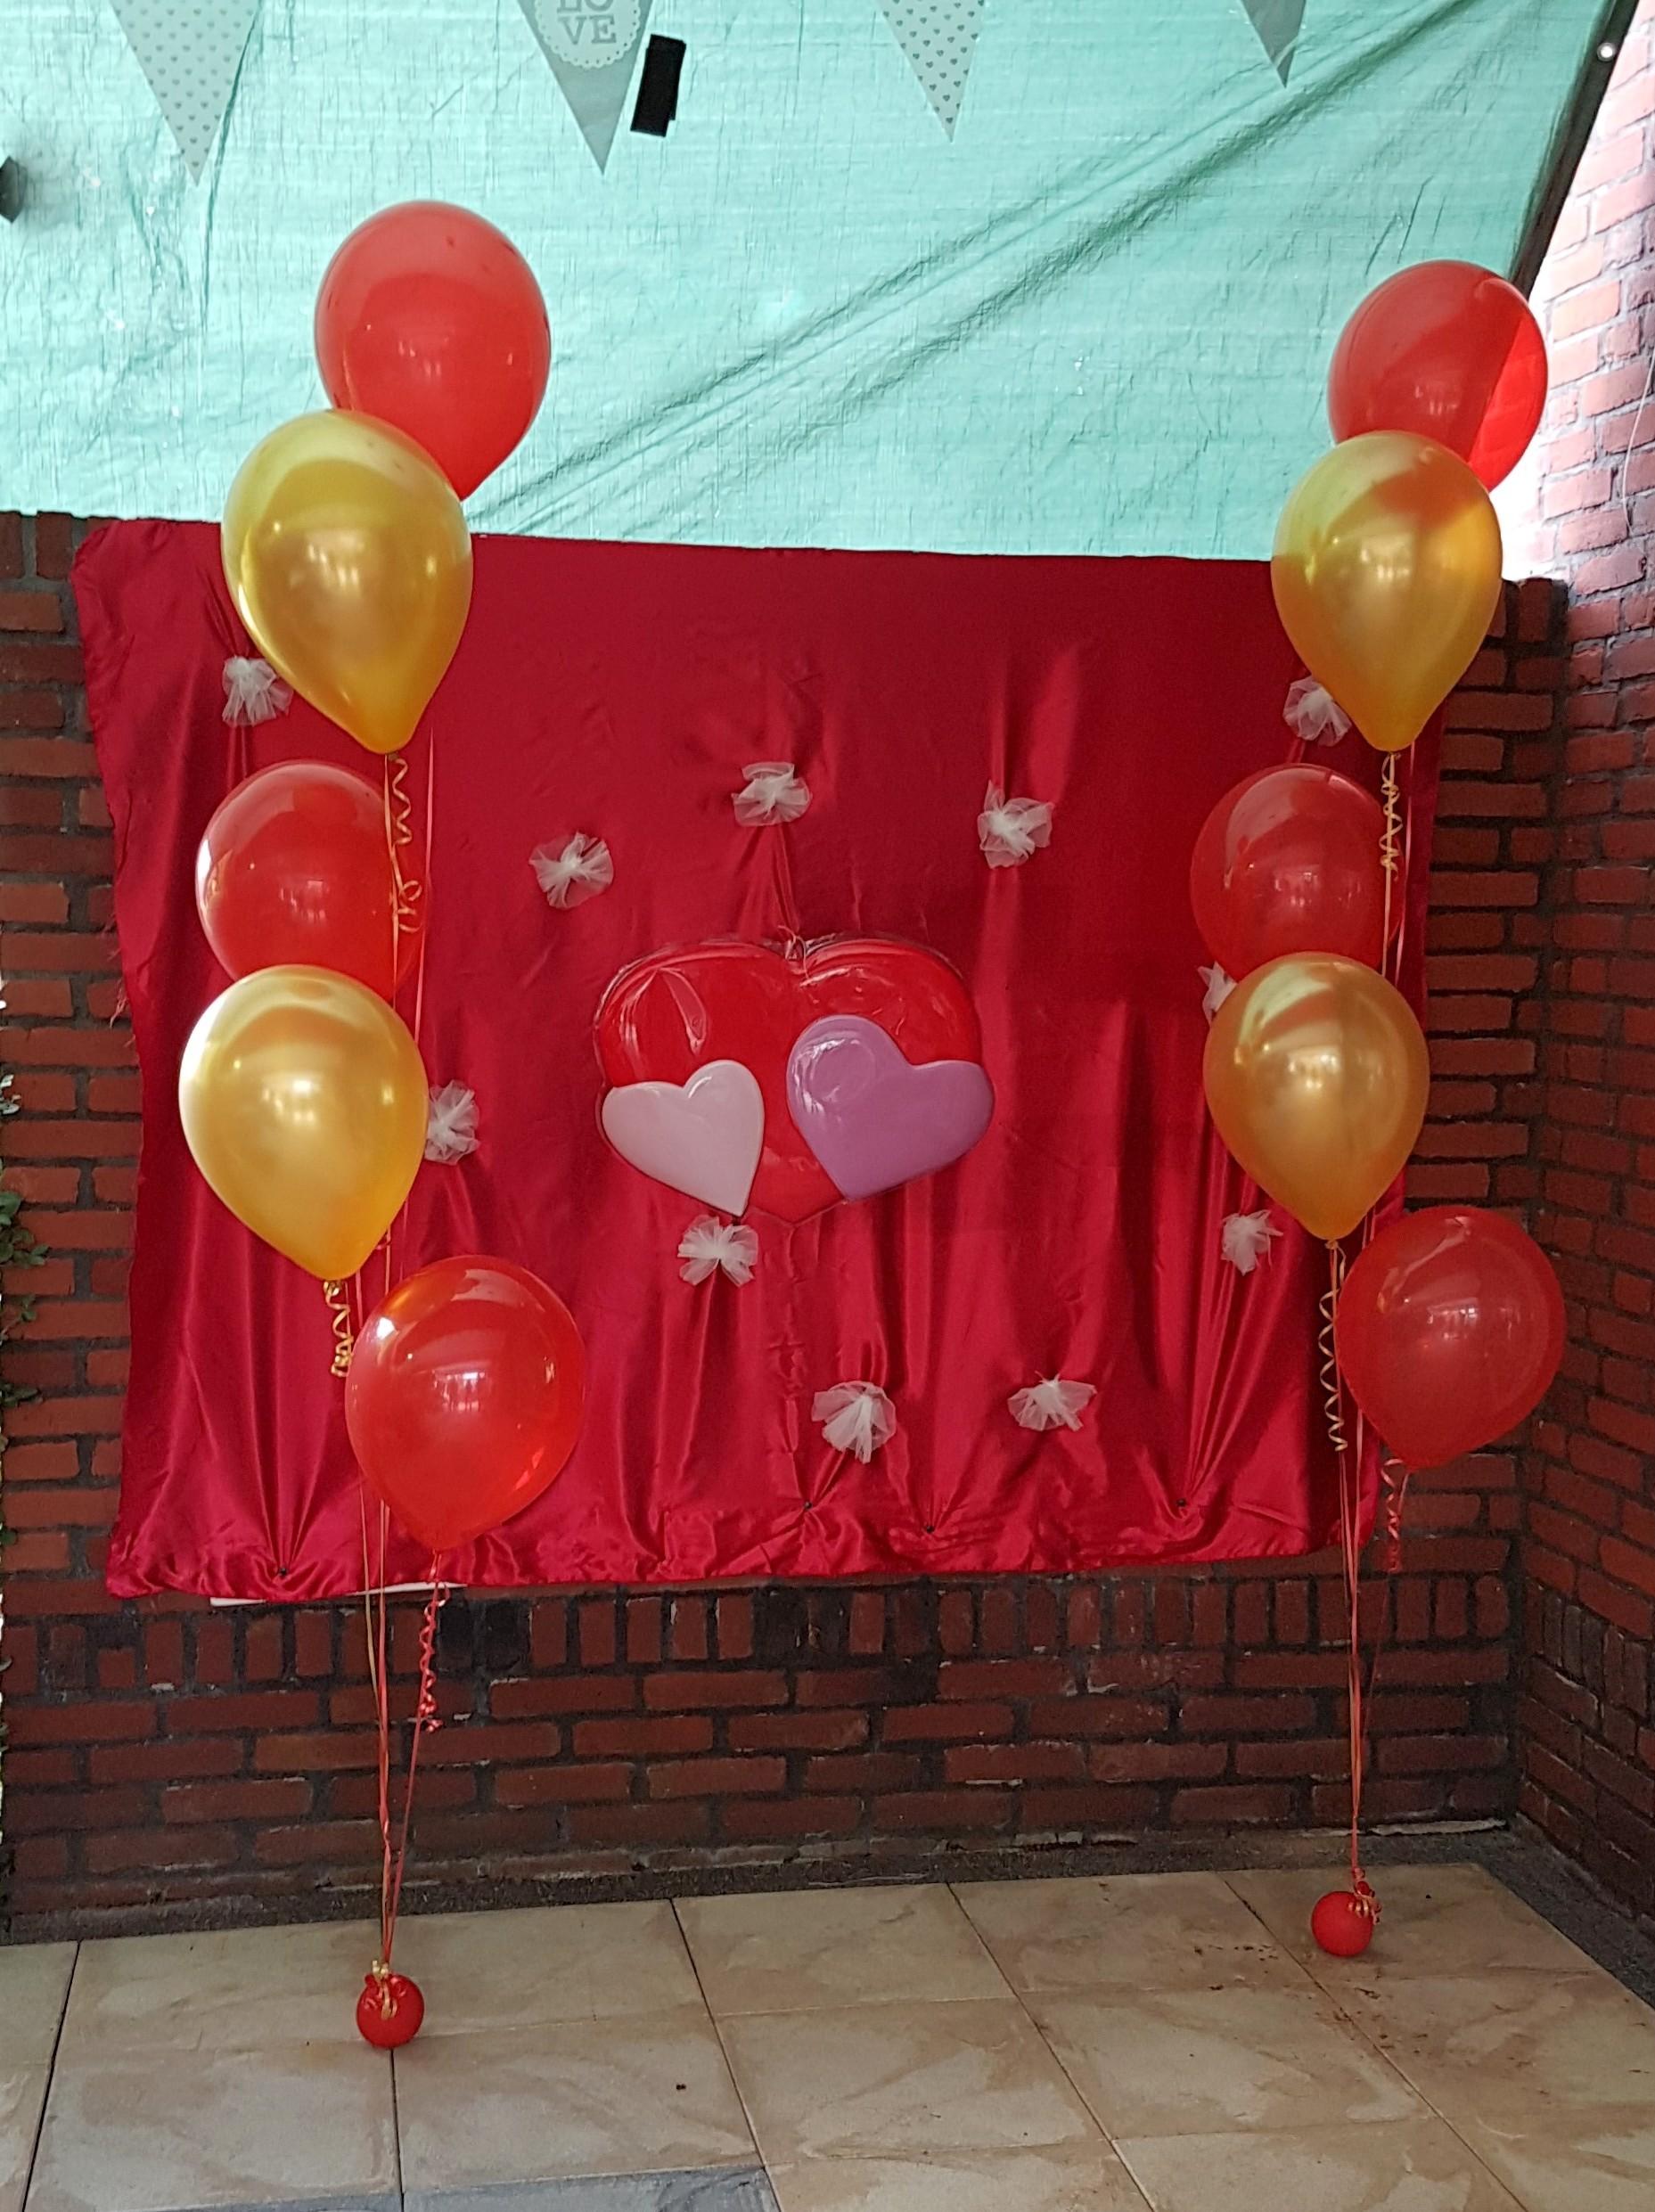 tros van 5 ballonnen